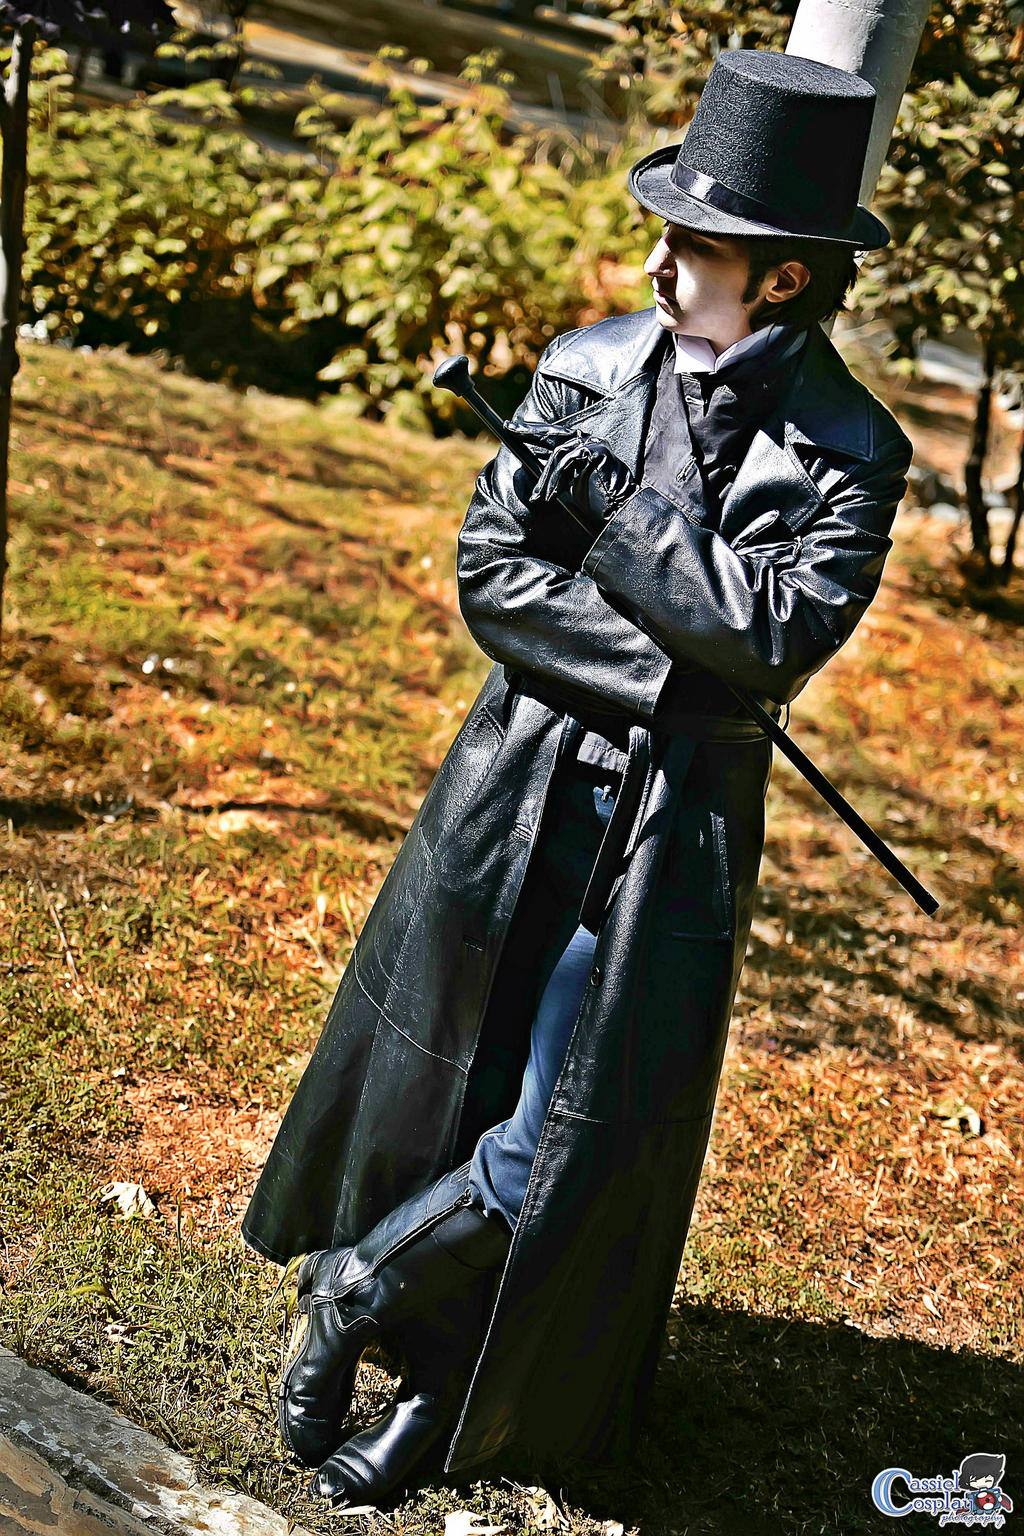 les miserables - ash williams cosplaybasiliskrules on deviantart